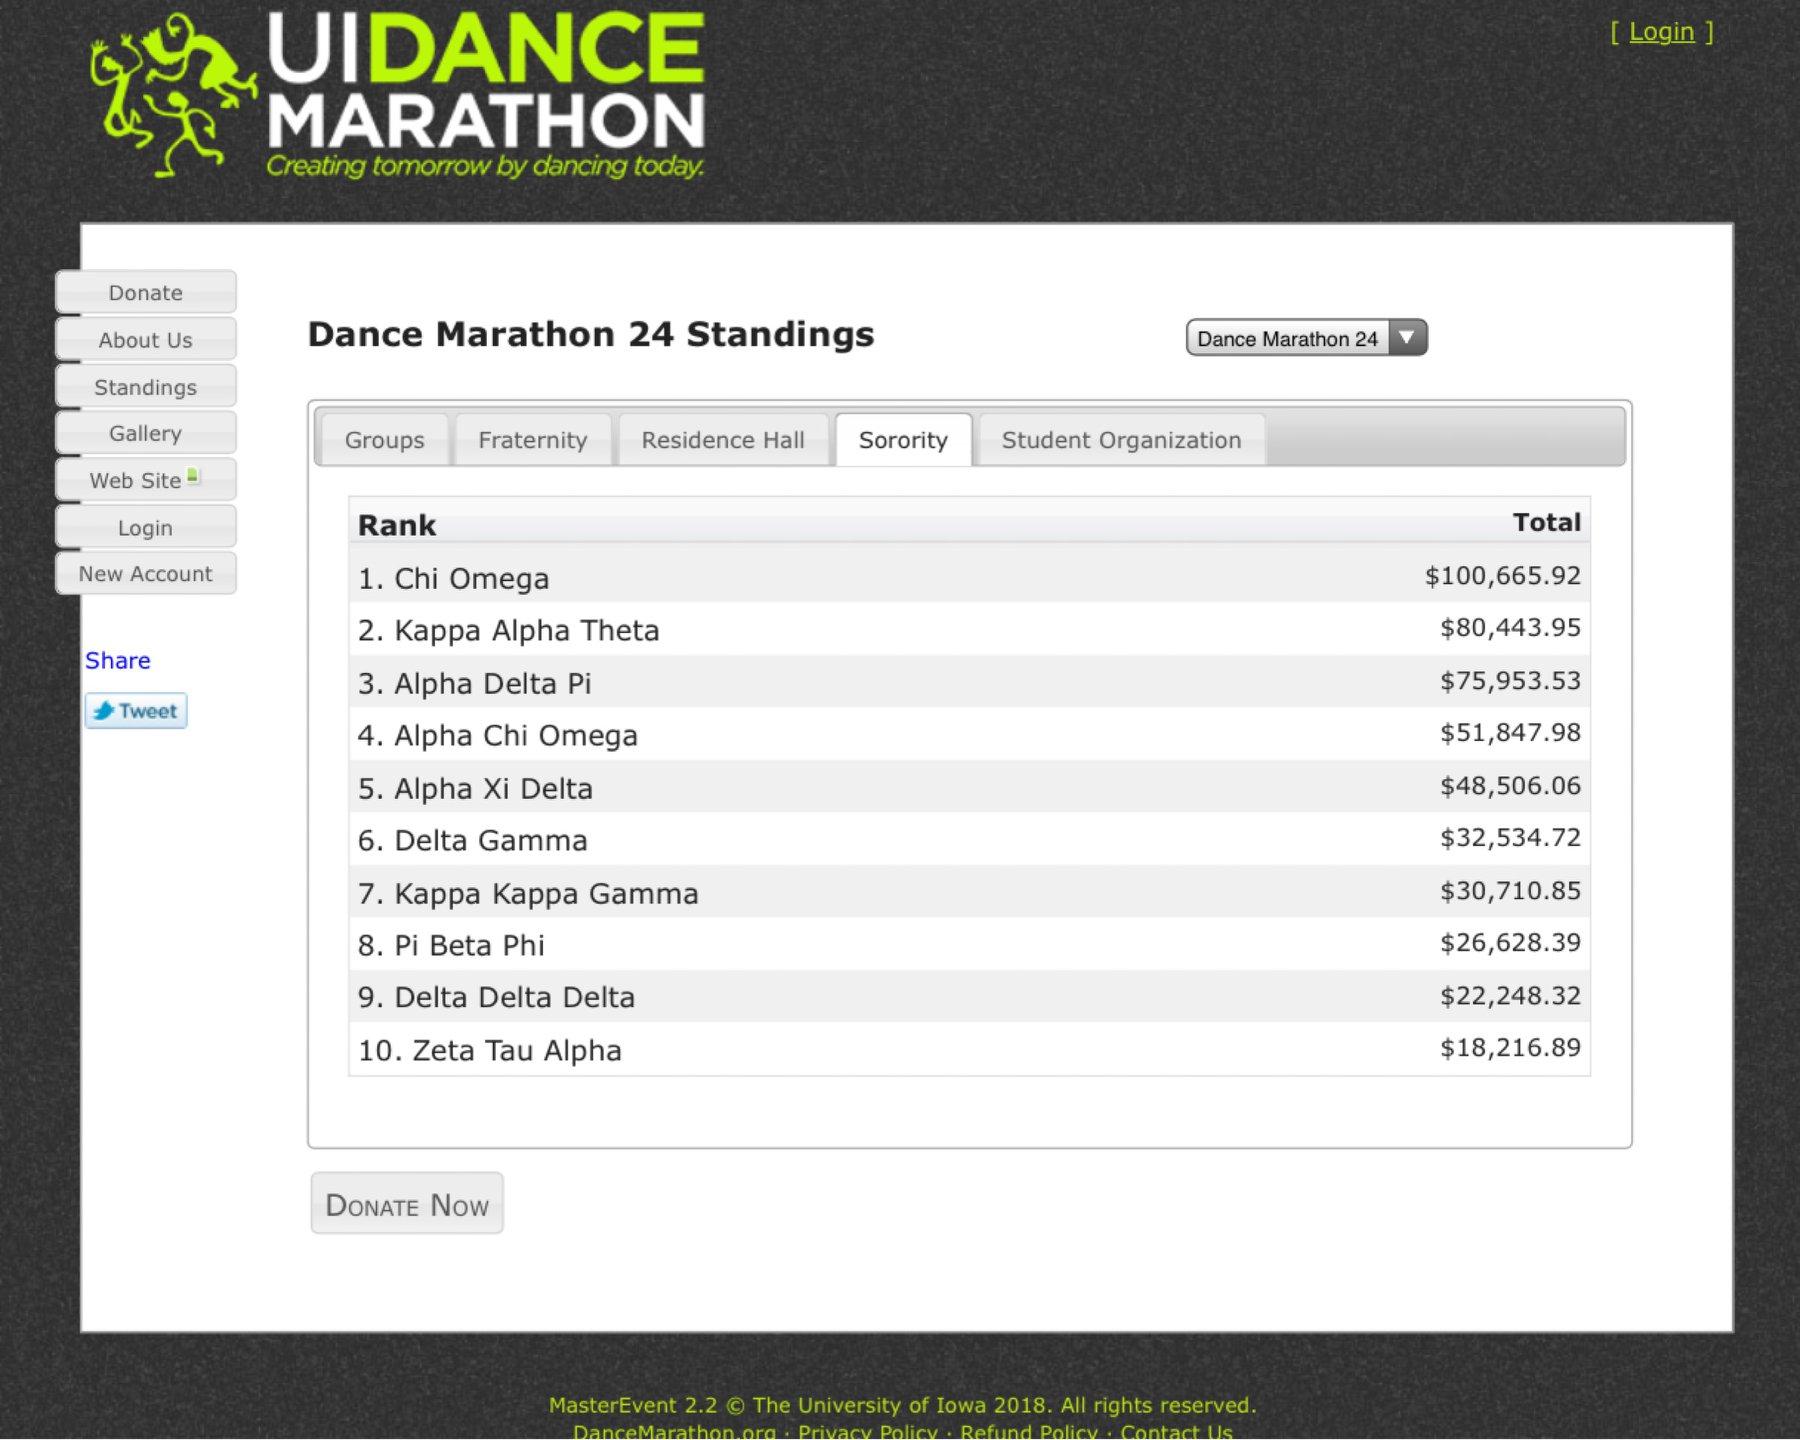 dance-marathon-greek-student-organizations-standings-iowa.jpg